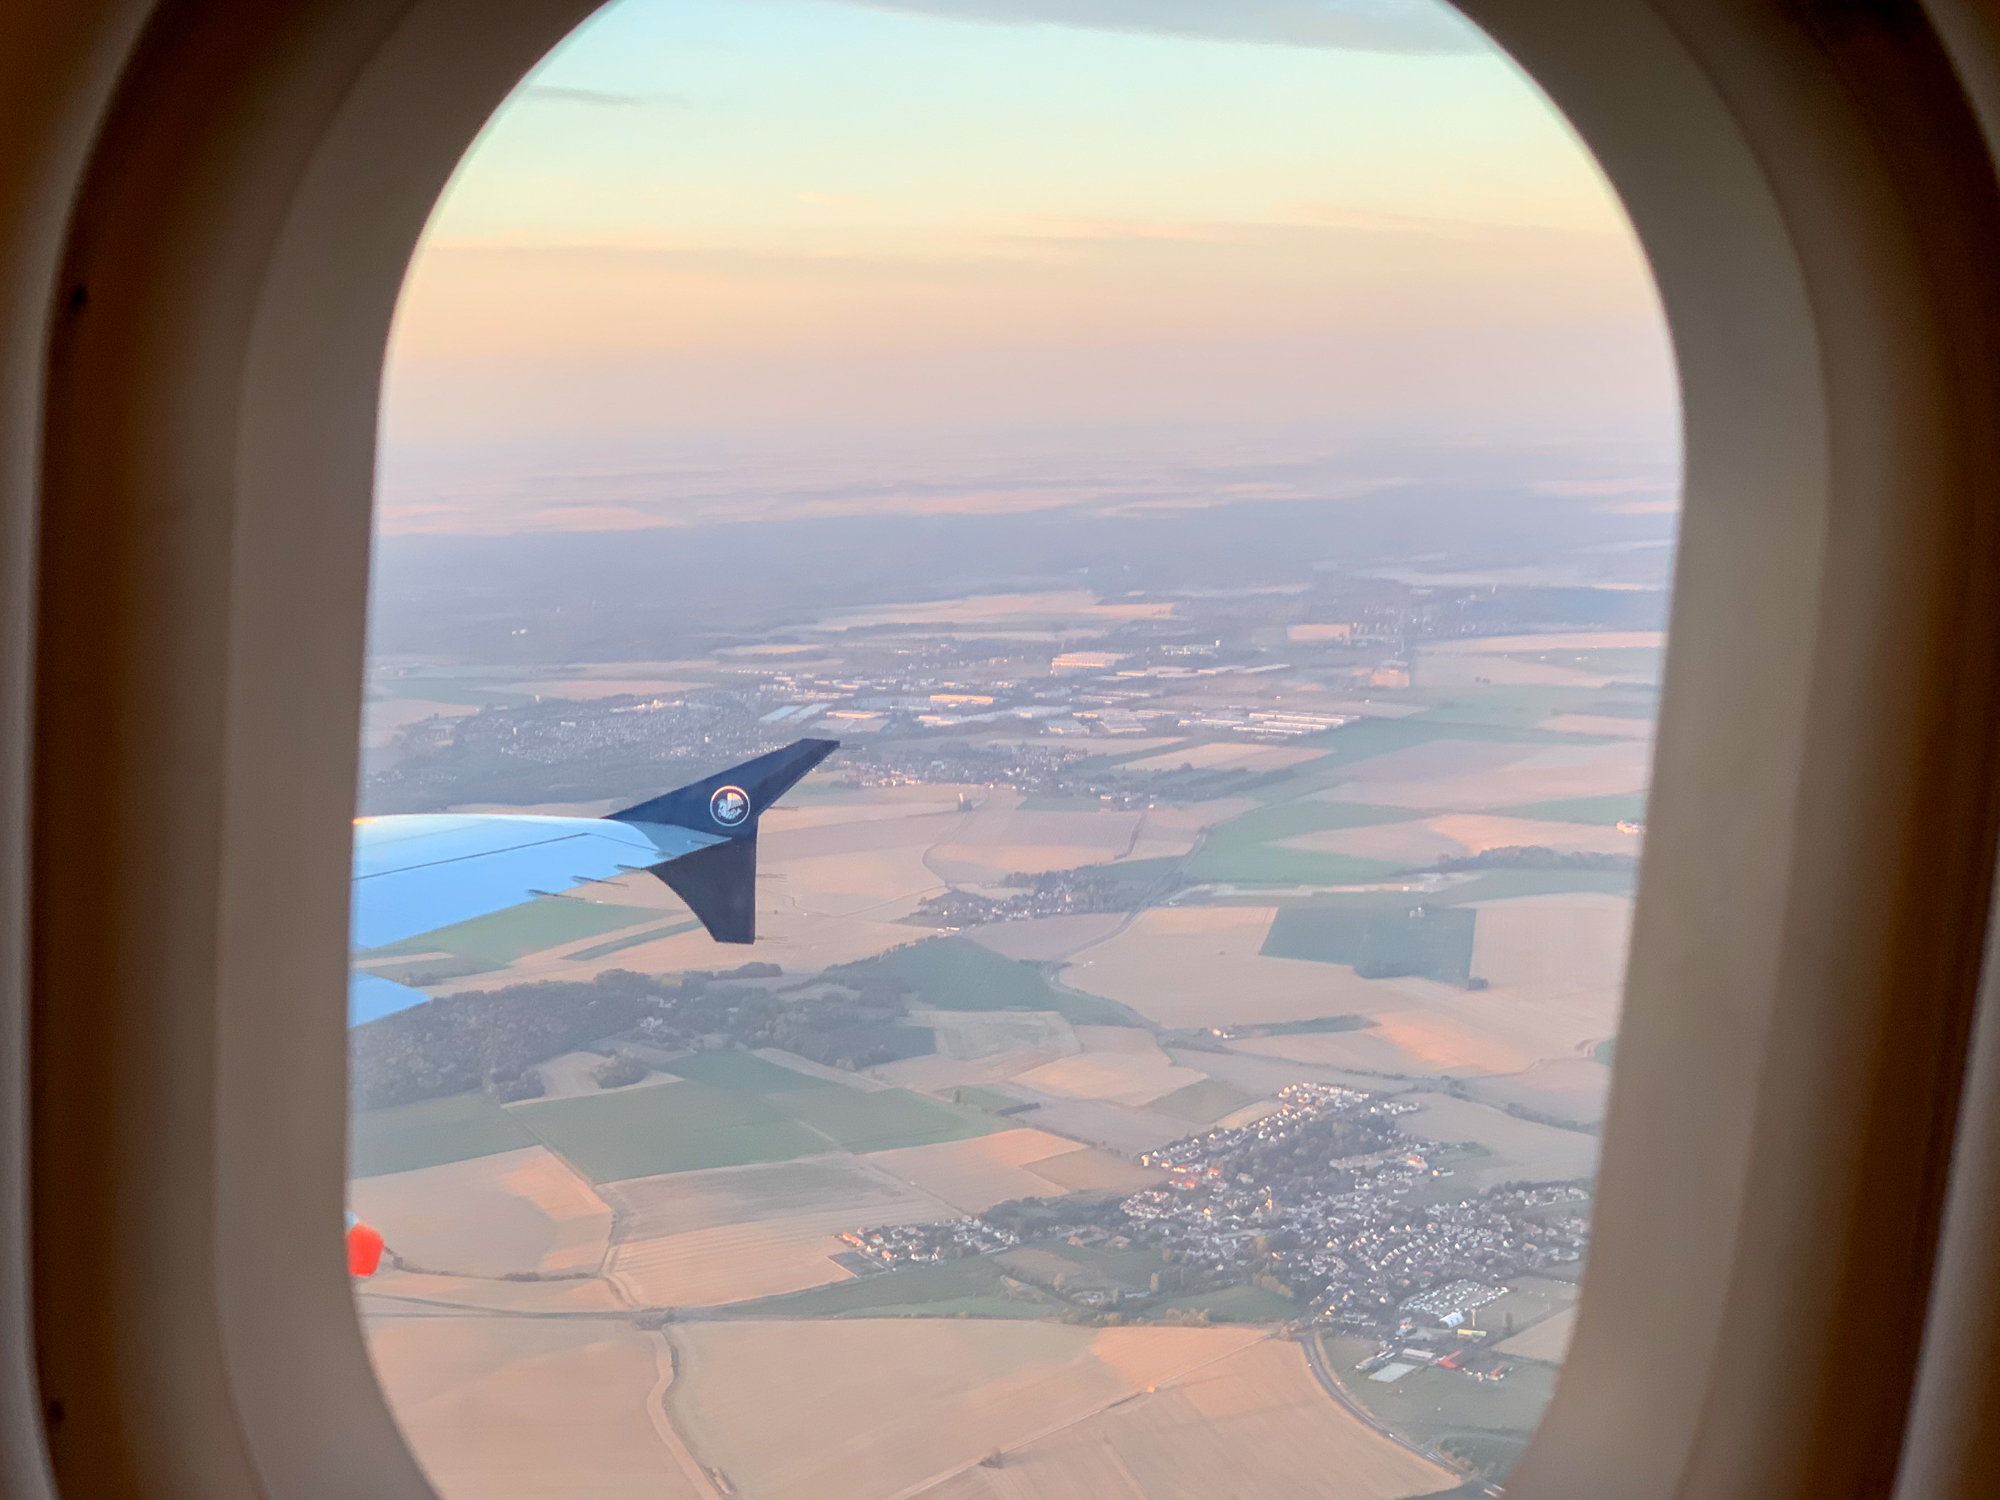 Air France A321 winglet